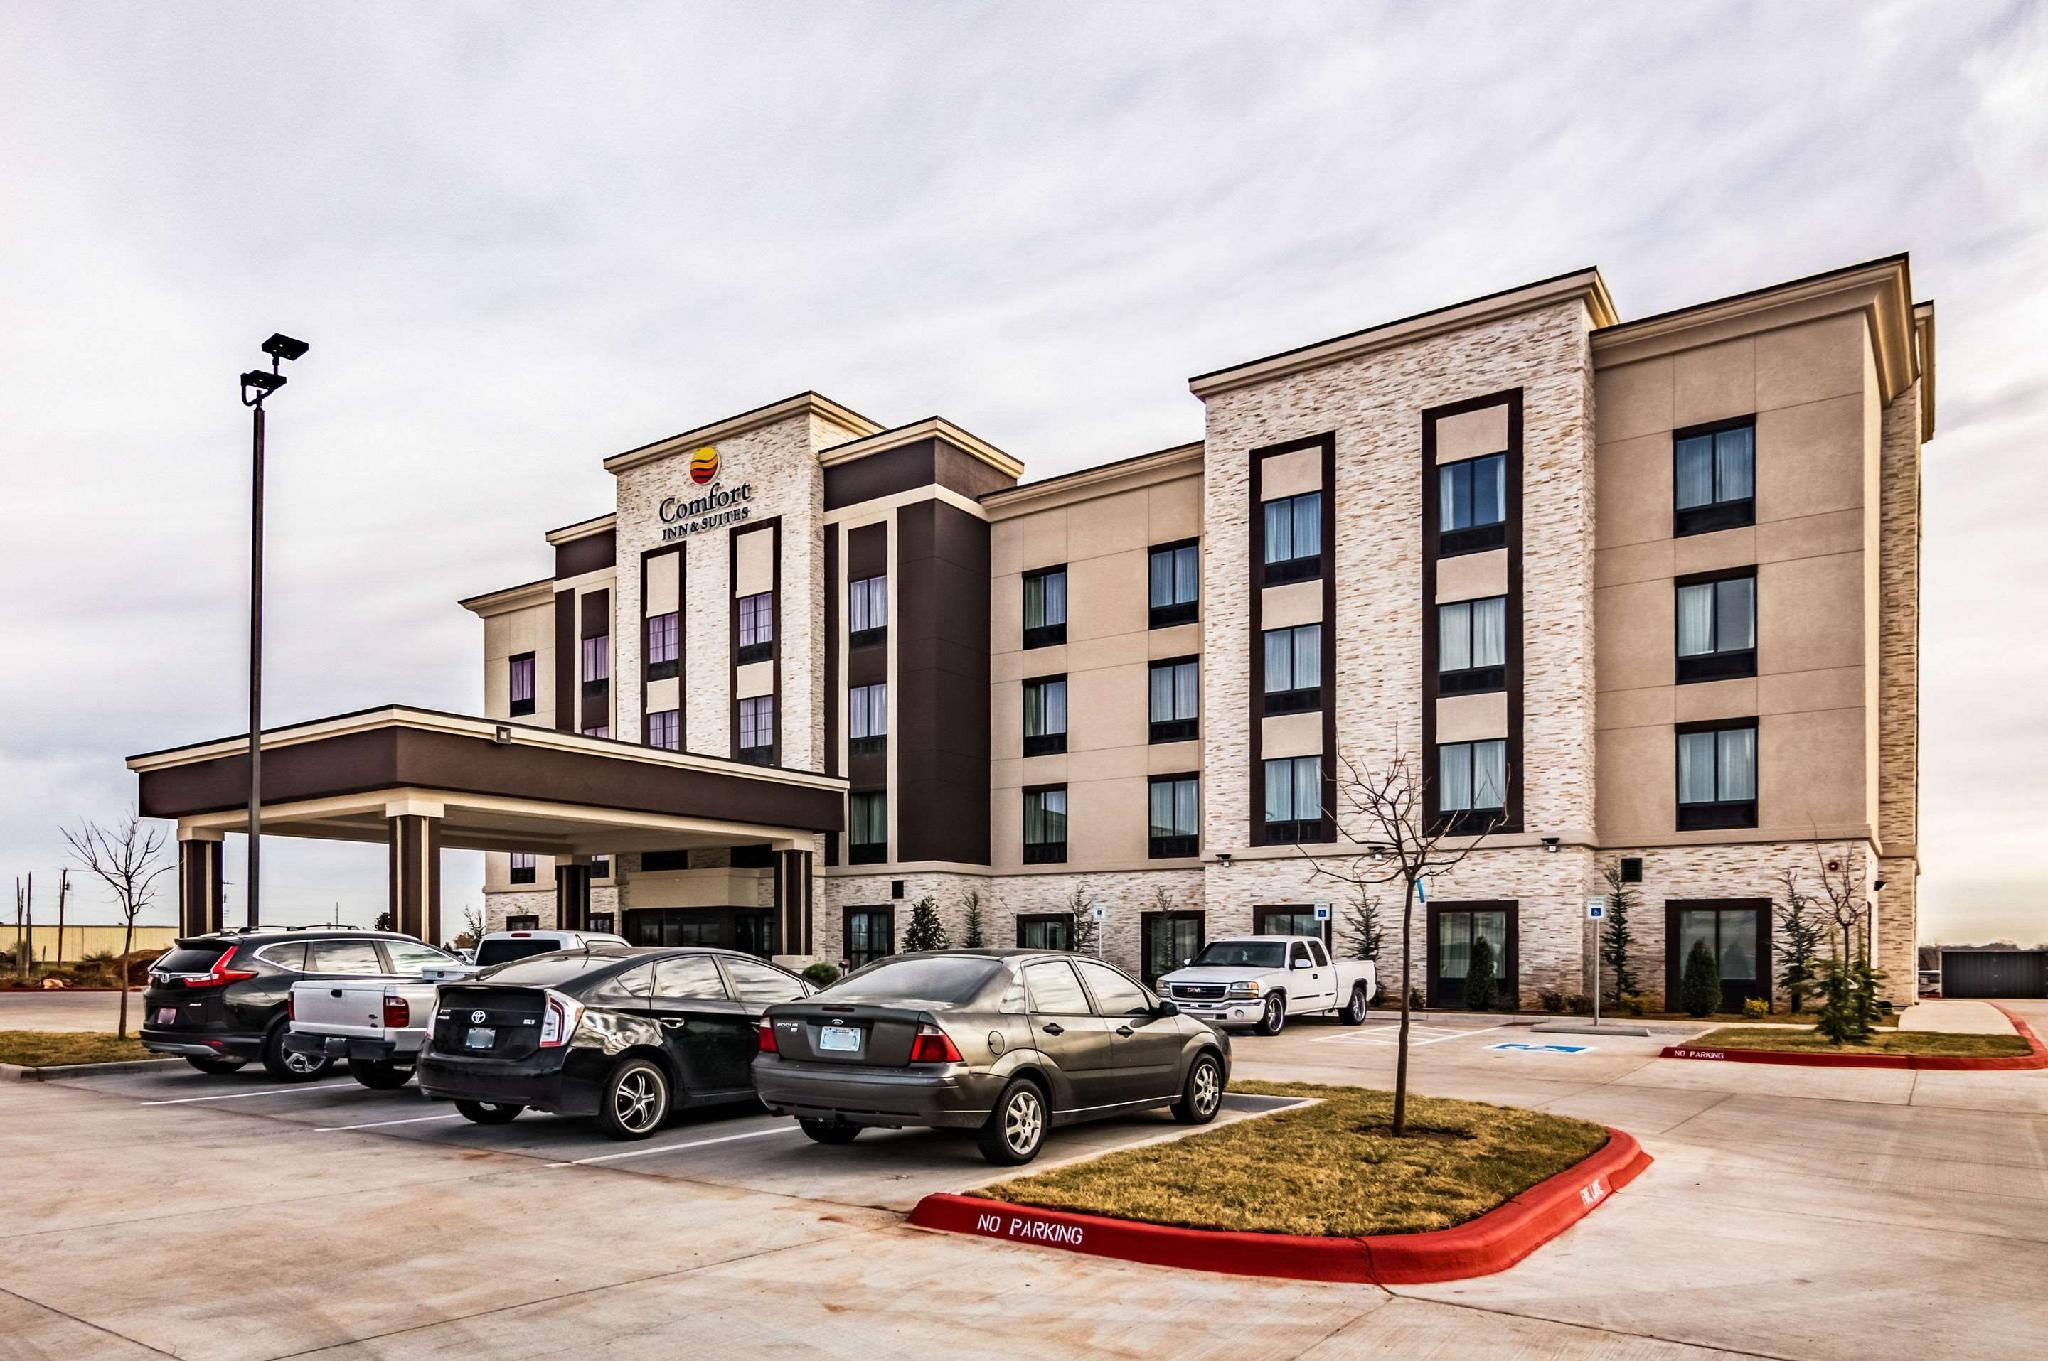 Comfort Inn And Suites Oklahoma City